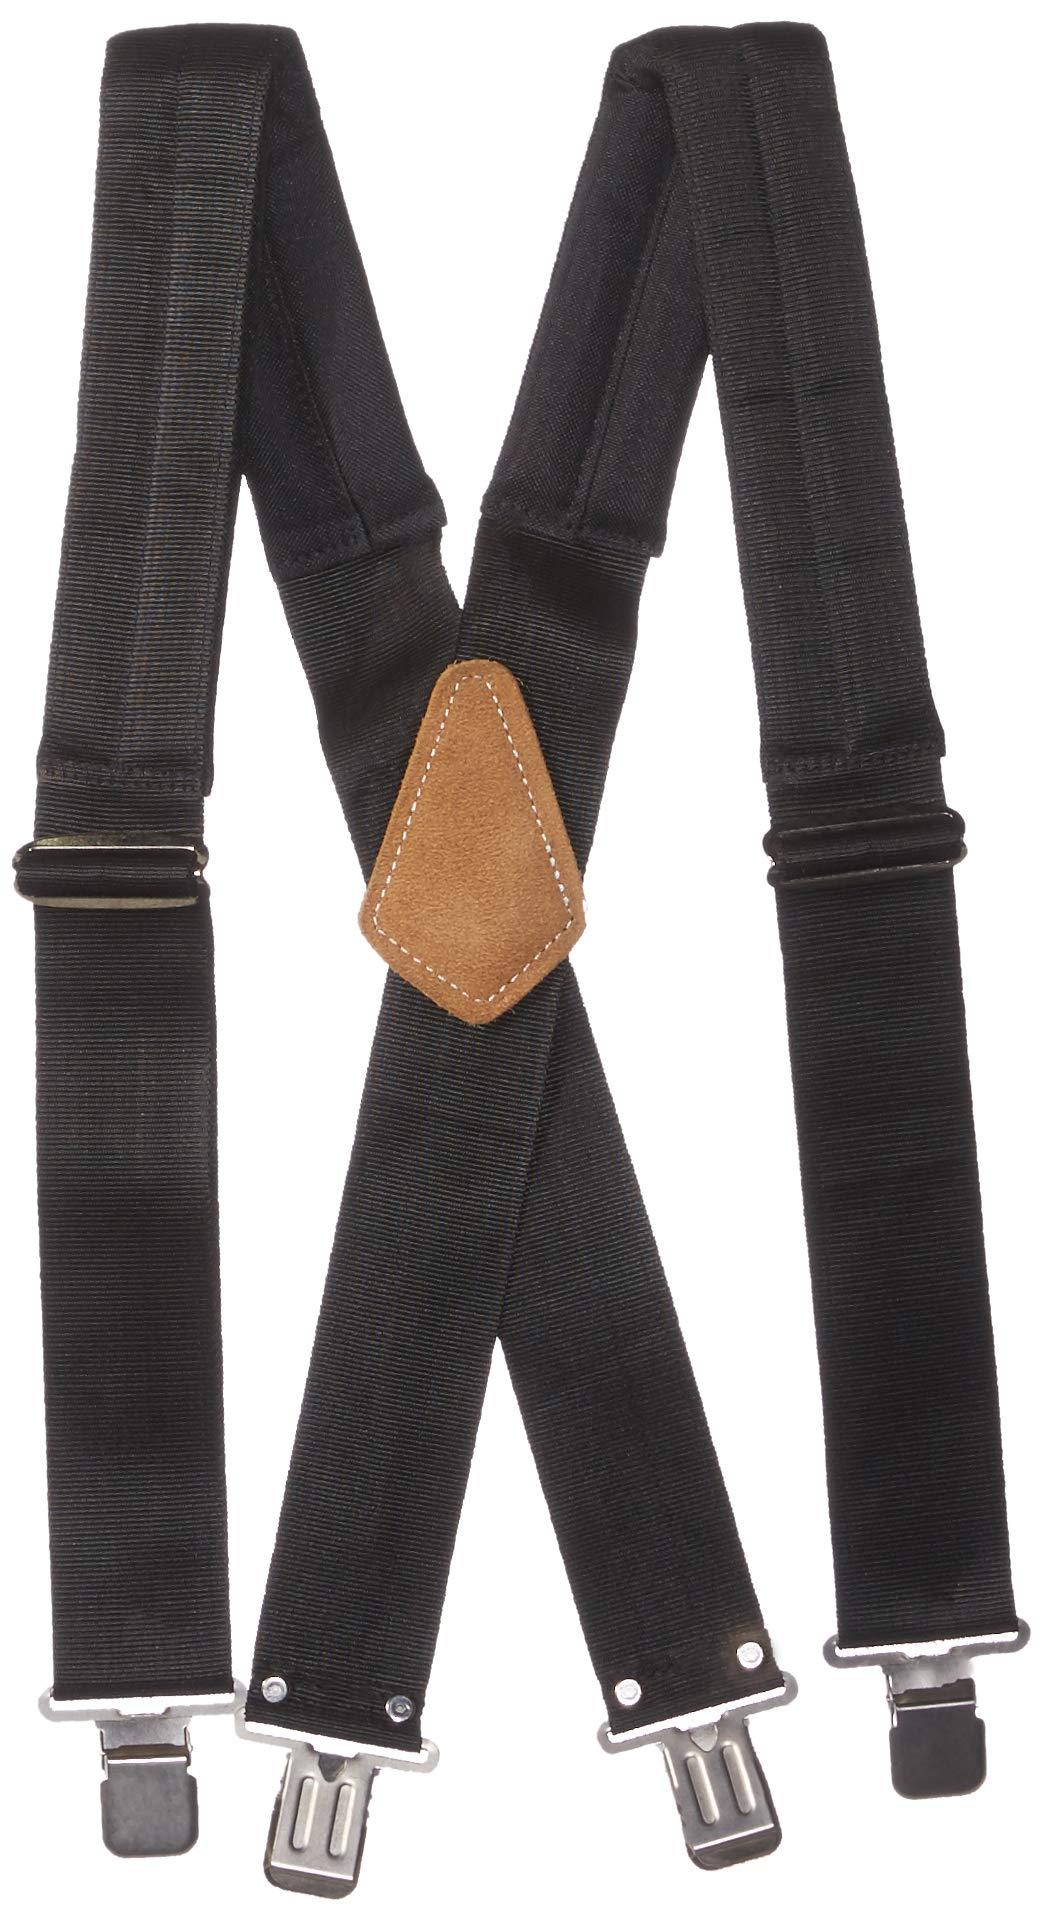 Style n Craft 95-013 Heavy Duty Padded Polyweb Work Suspenders